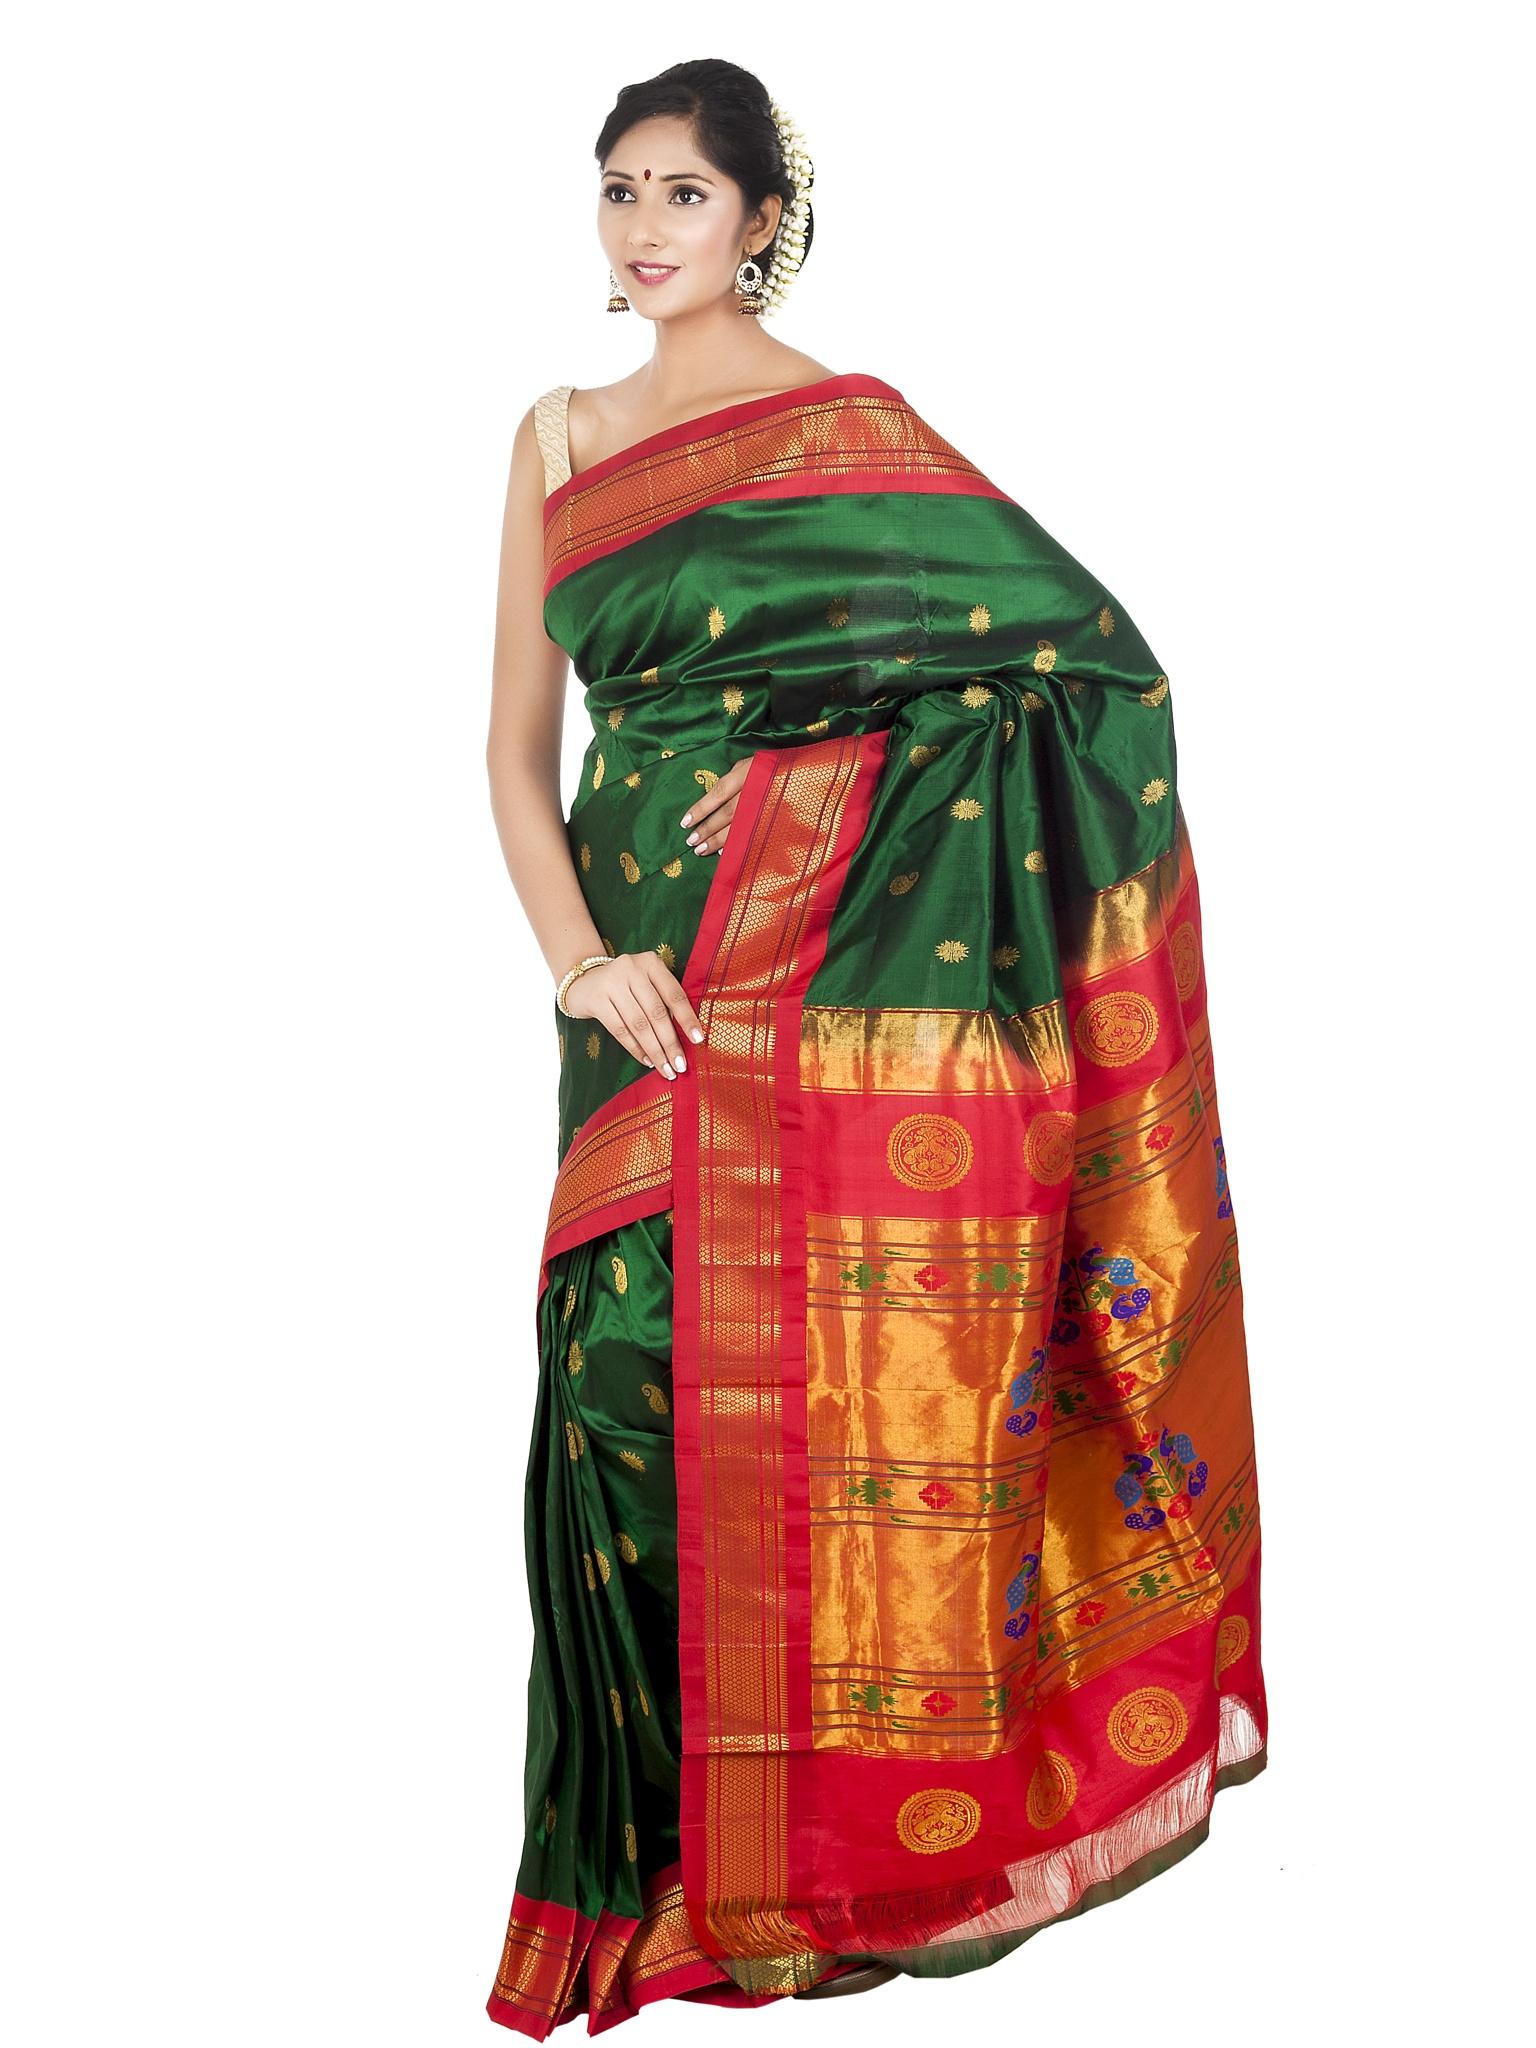 Handloom silk paithani sarees online by onlypaithani